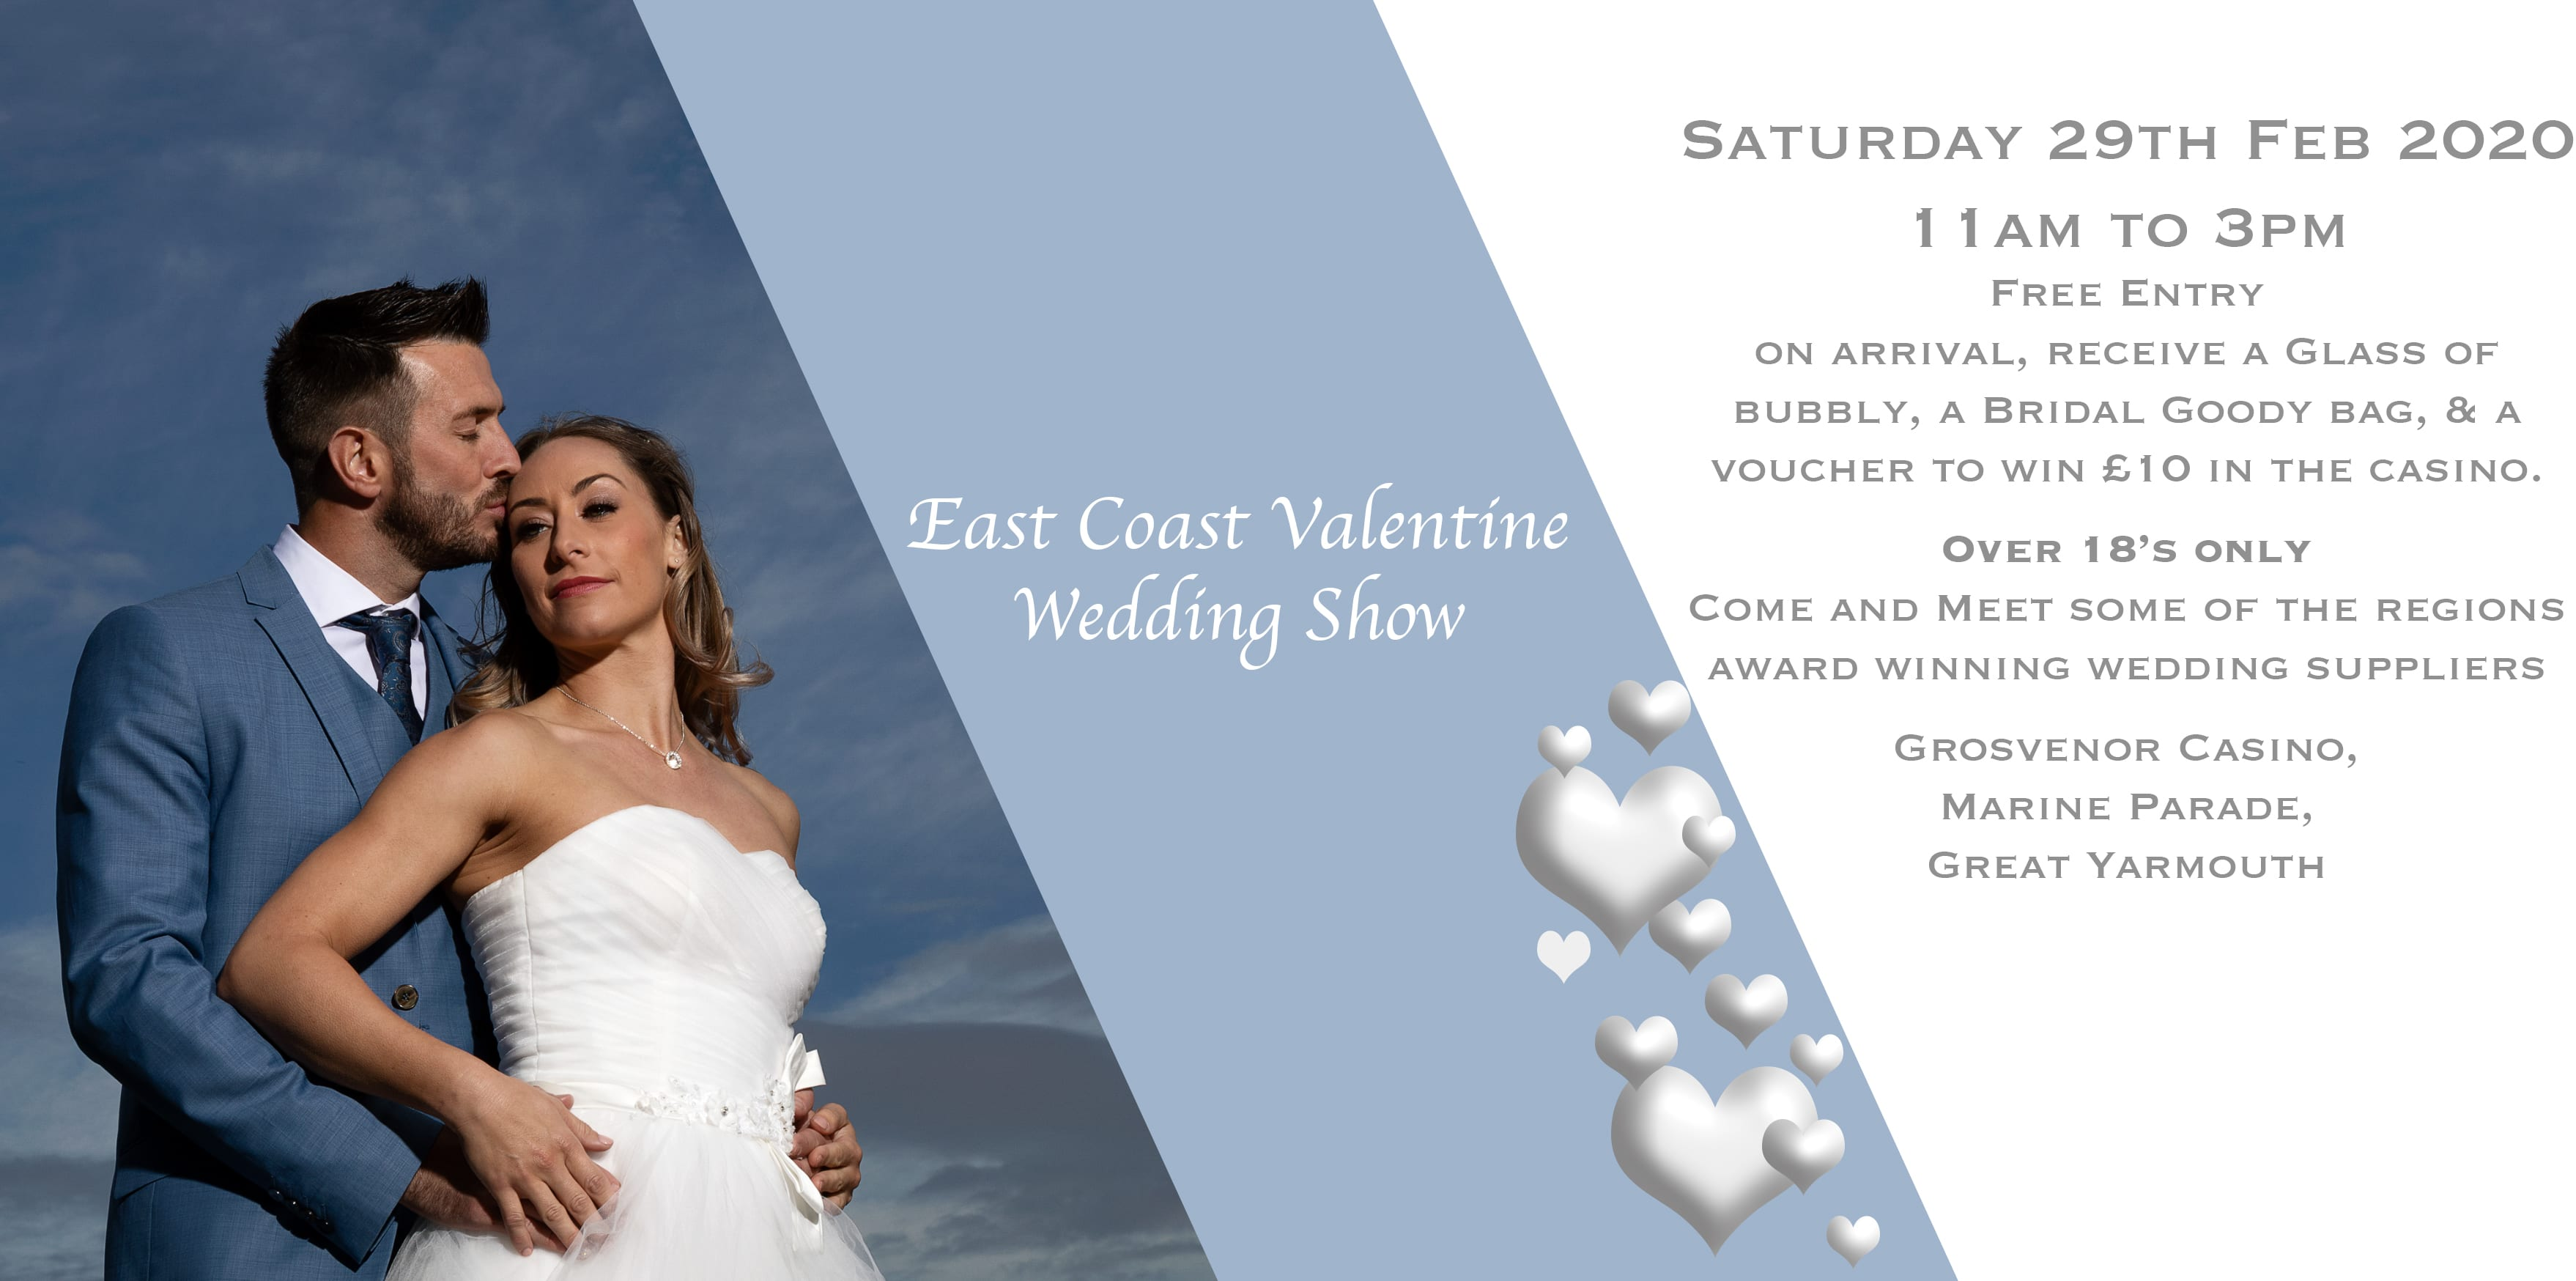 East Coast Valentine Wedding Show